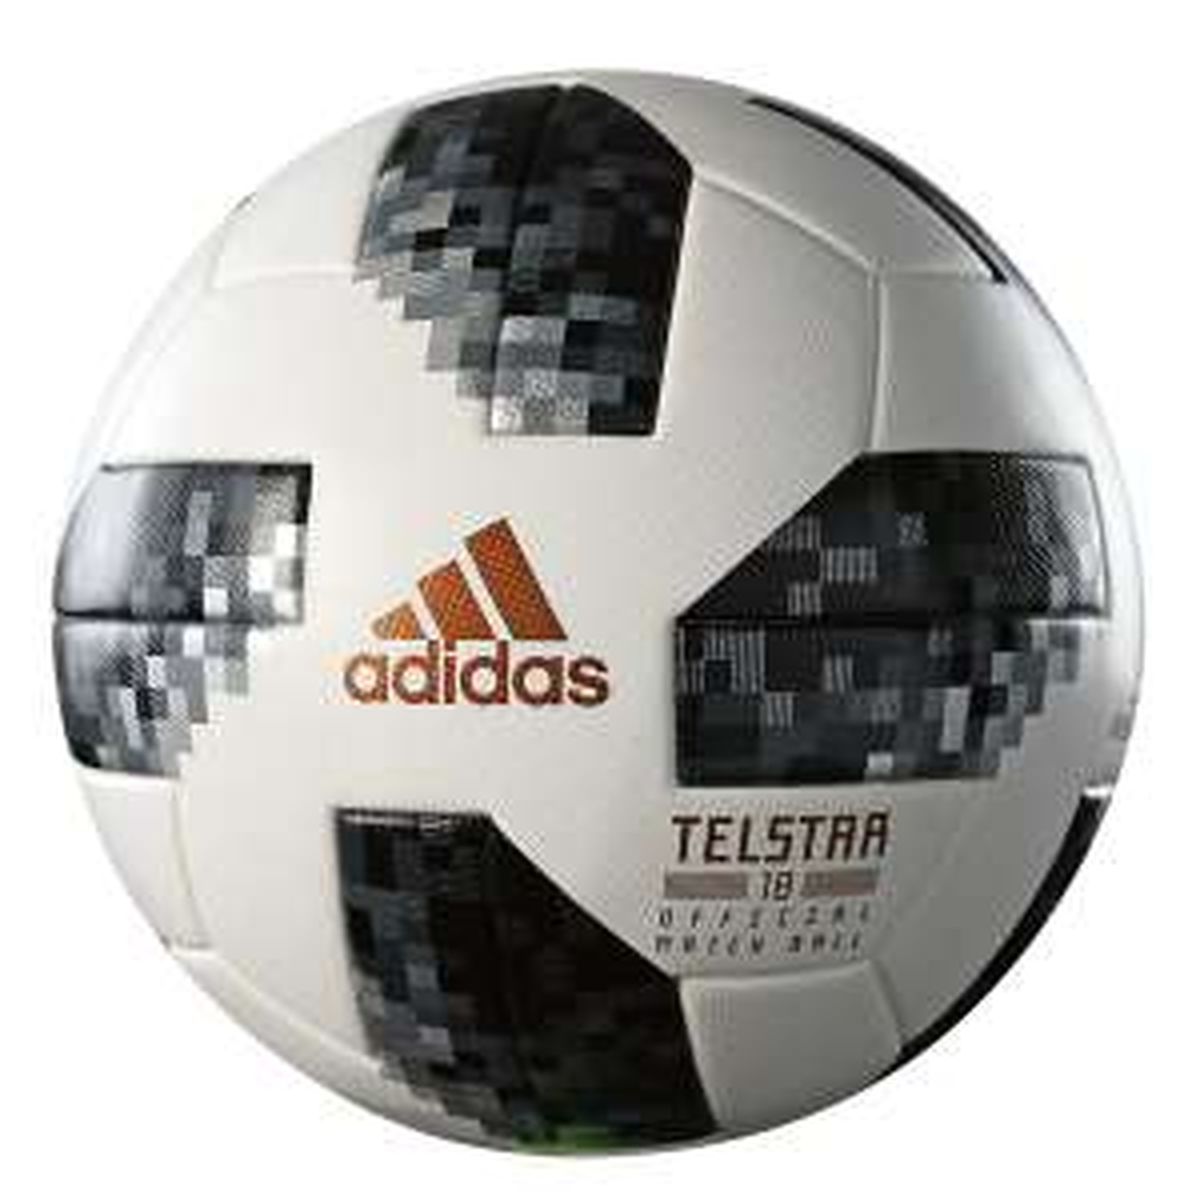 Adidas Telstar Replica dank App umsonst